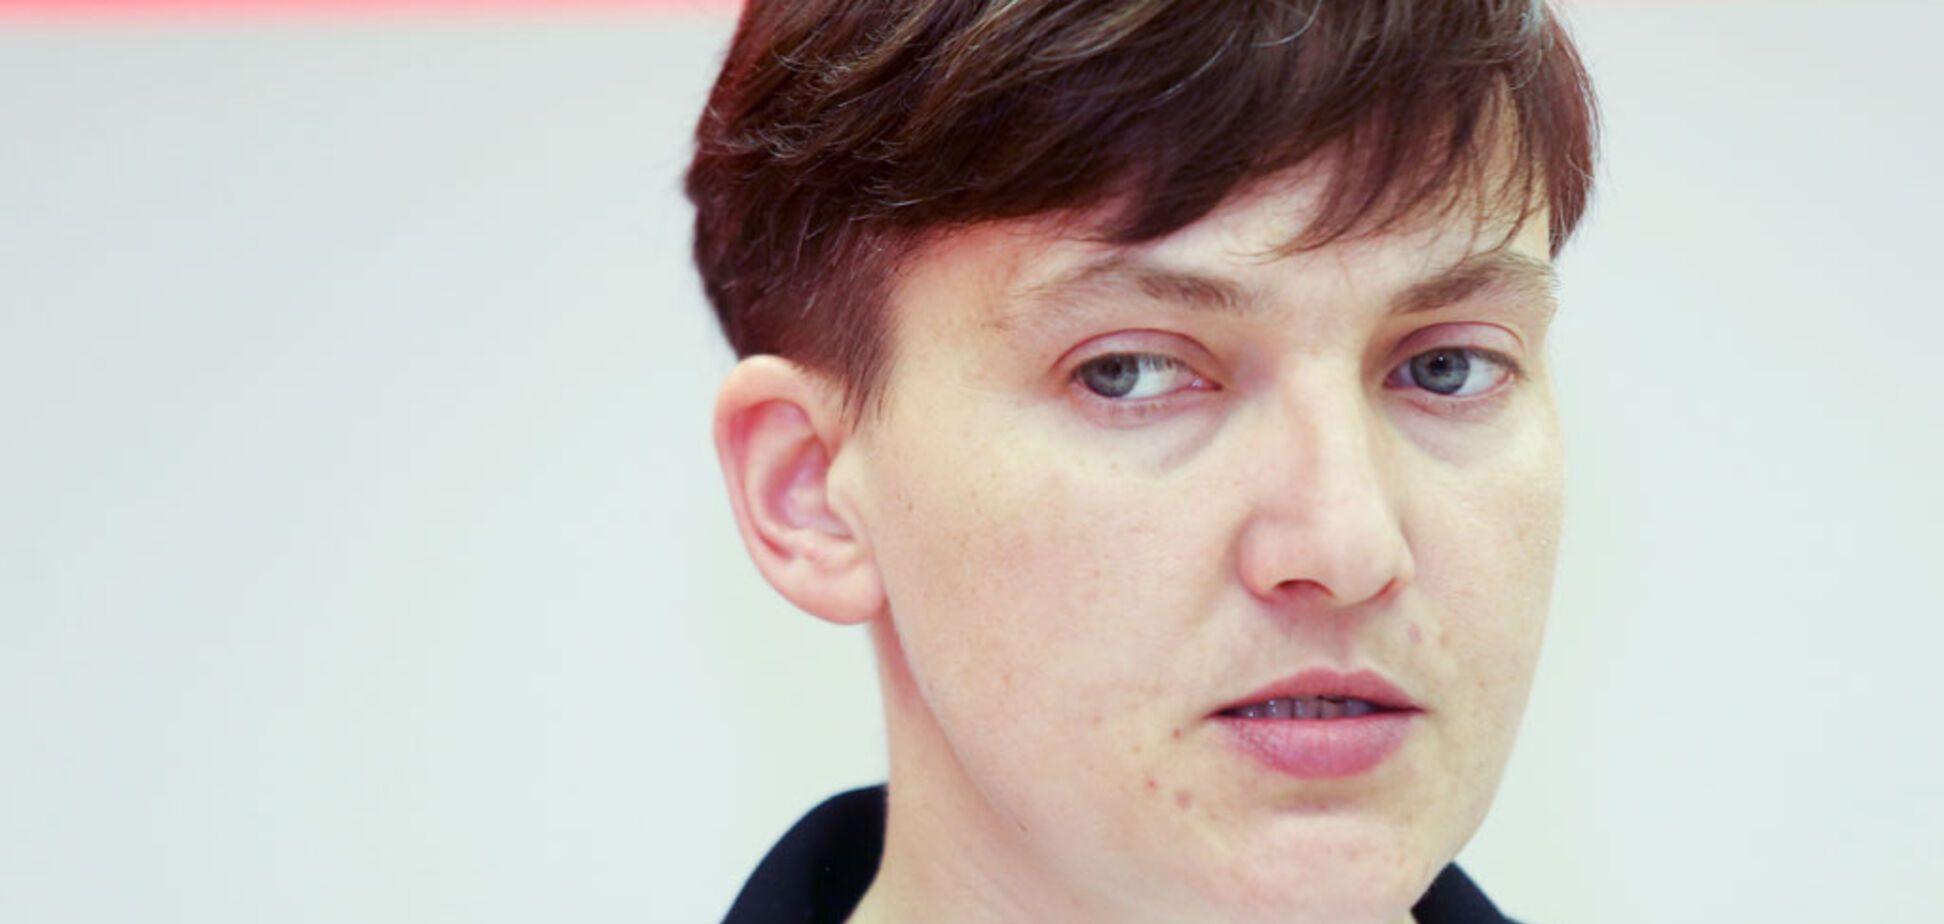 'Тяжко ей': Савченко подловили на странном поведении в Раде